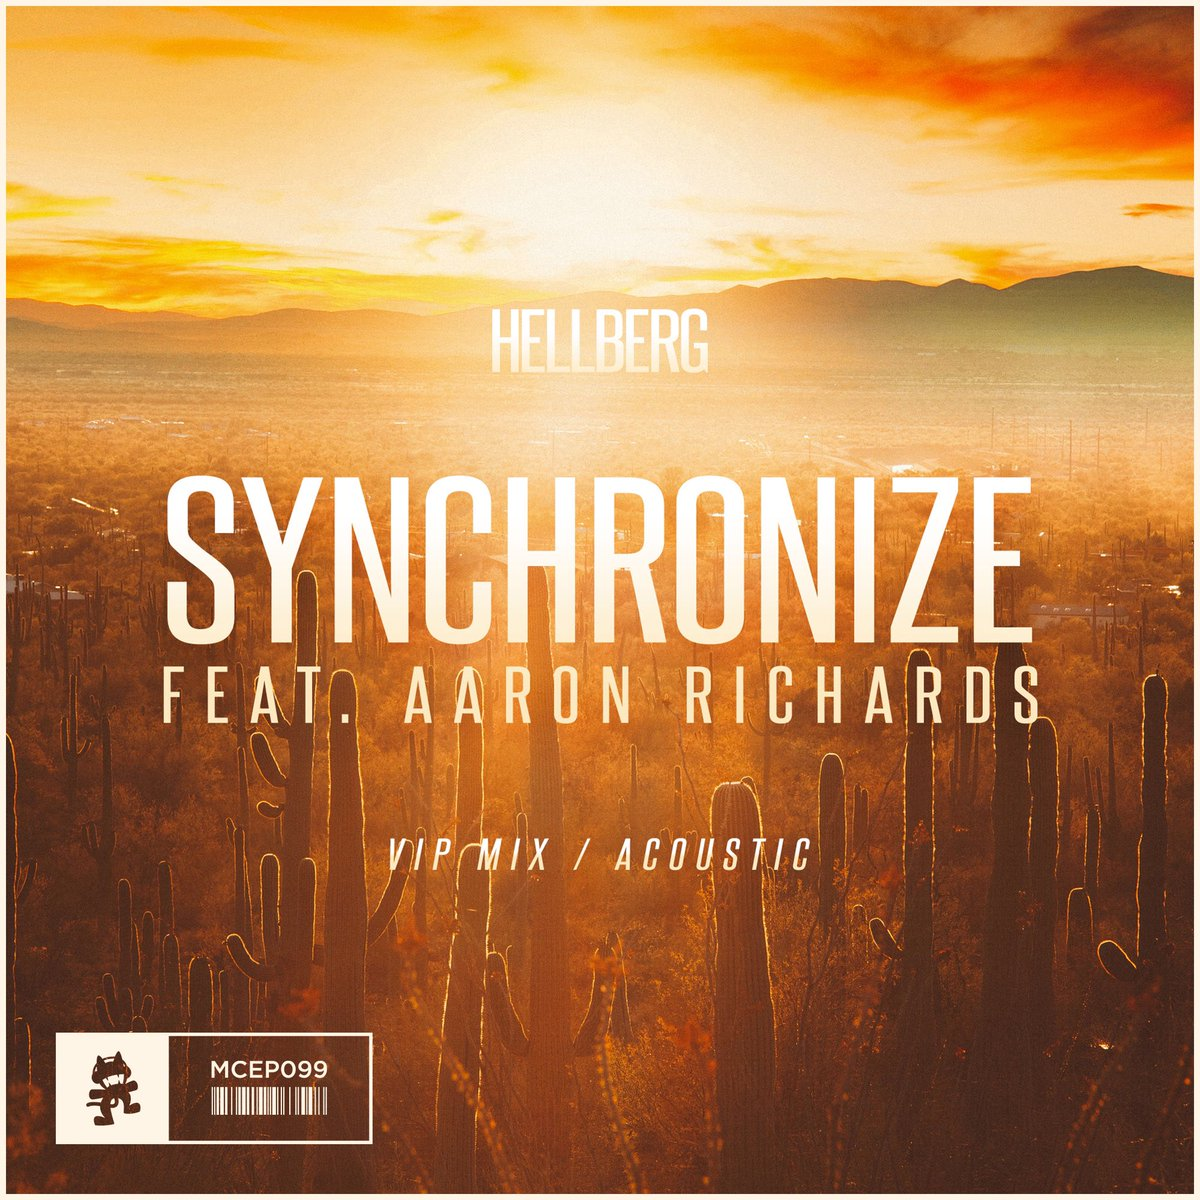 Synchronize (Acoustic)